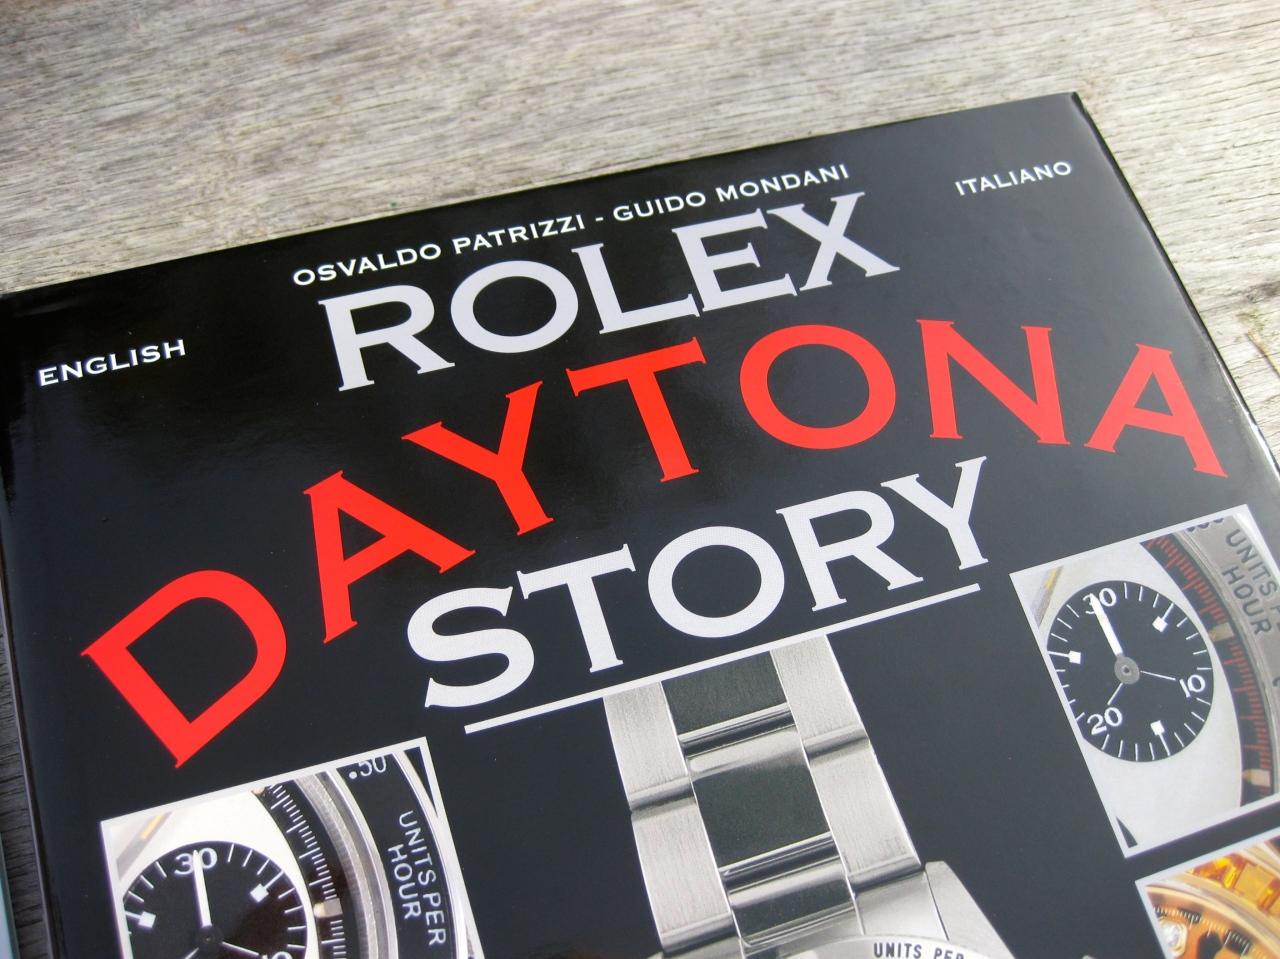 Mondani – Rolex DaytonaStory